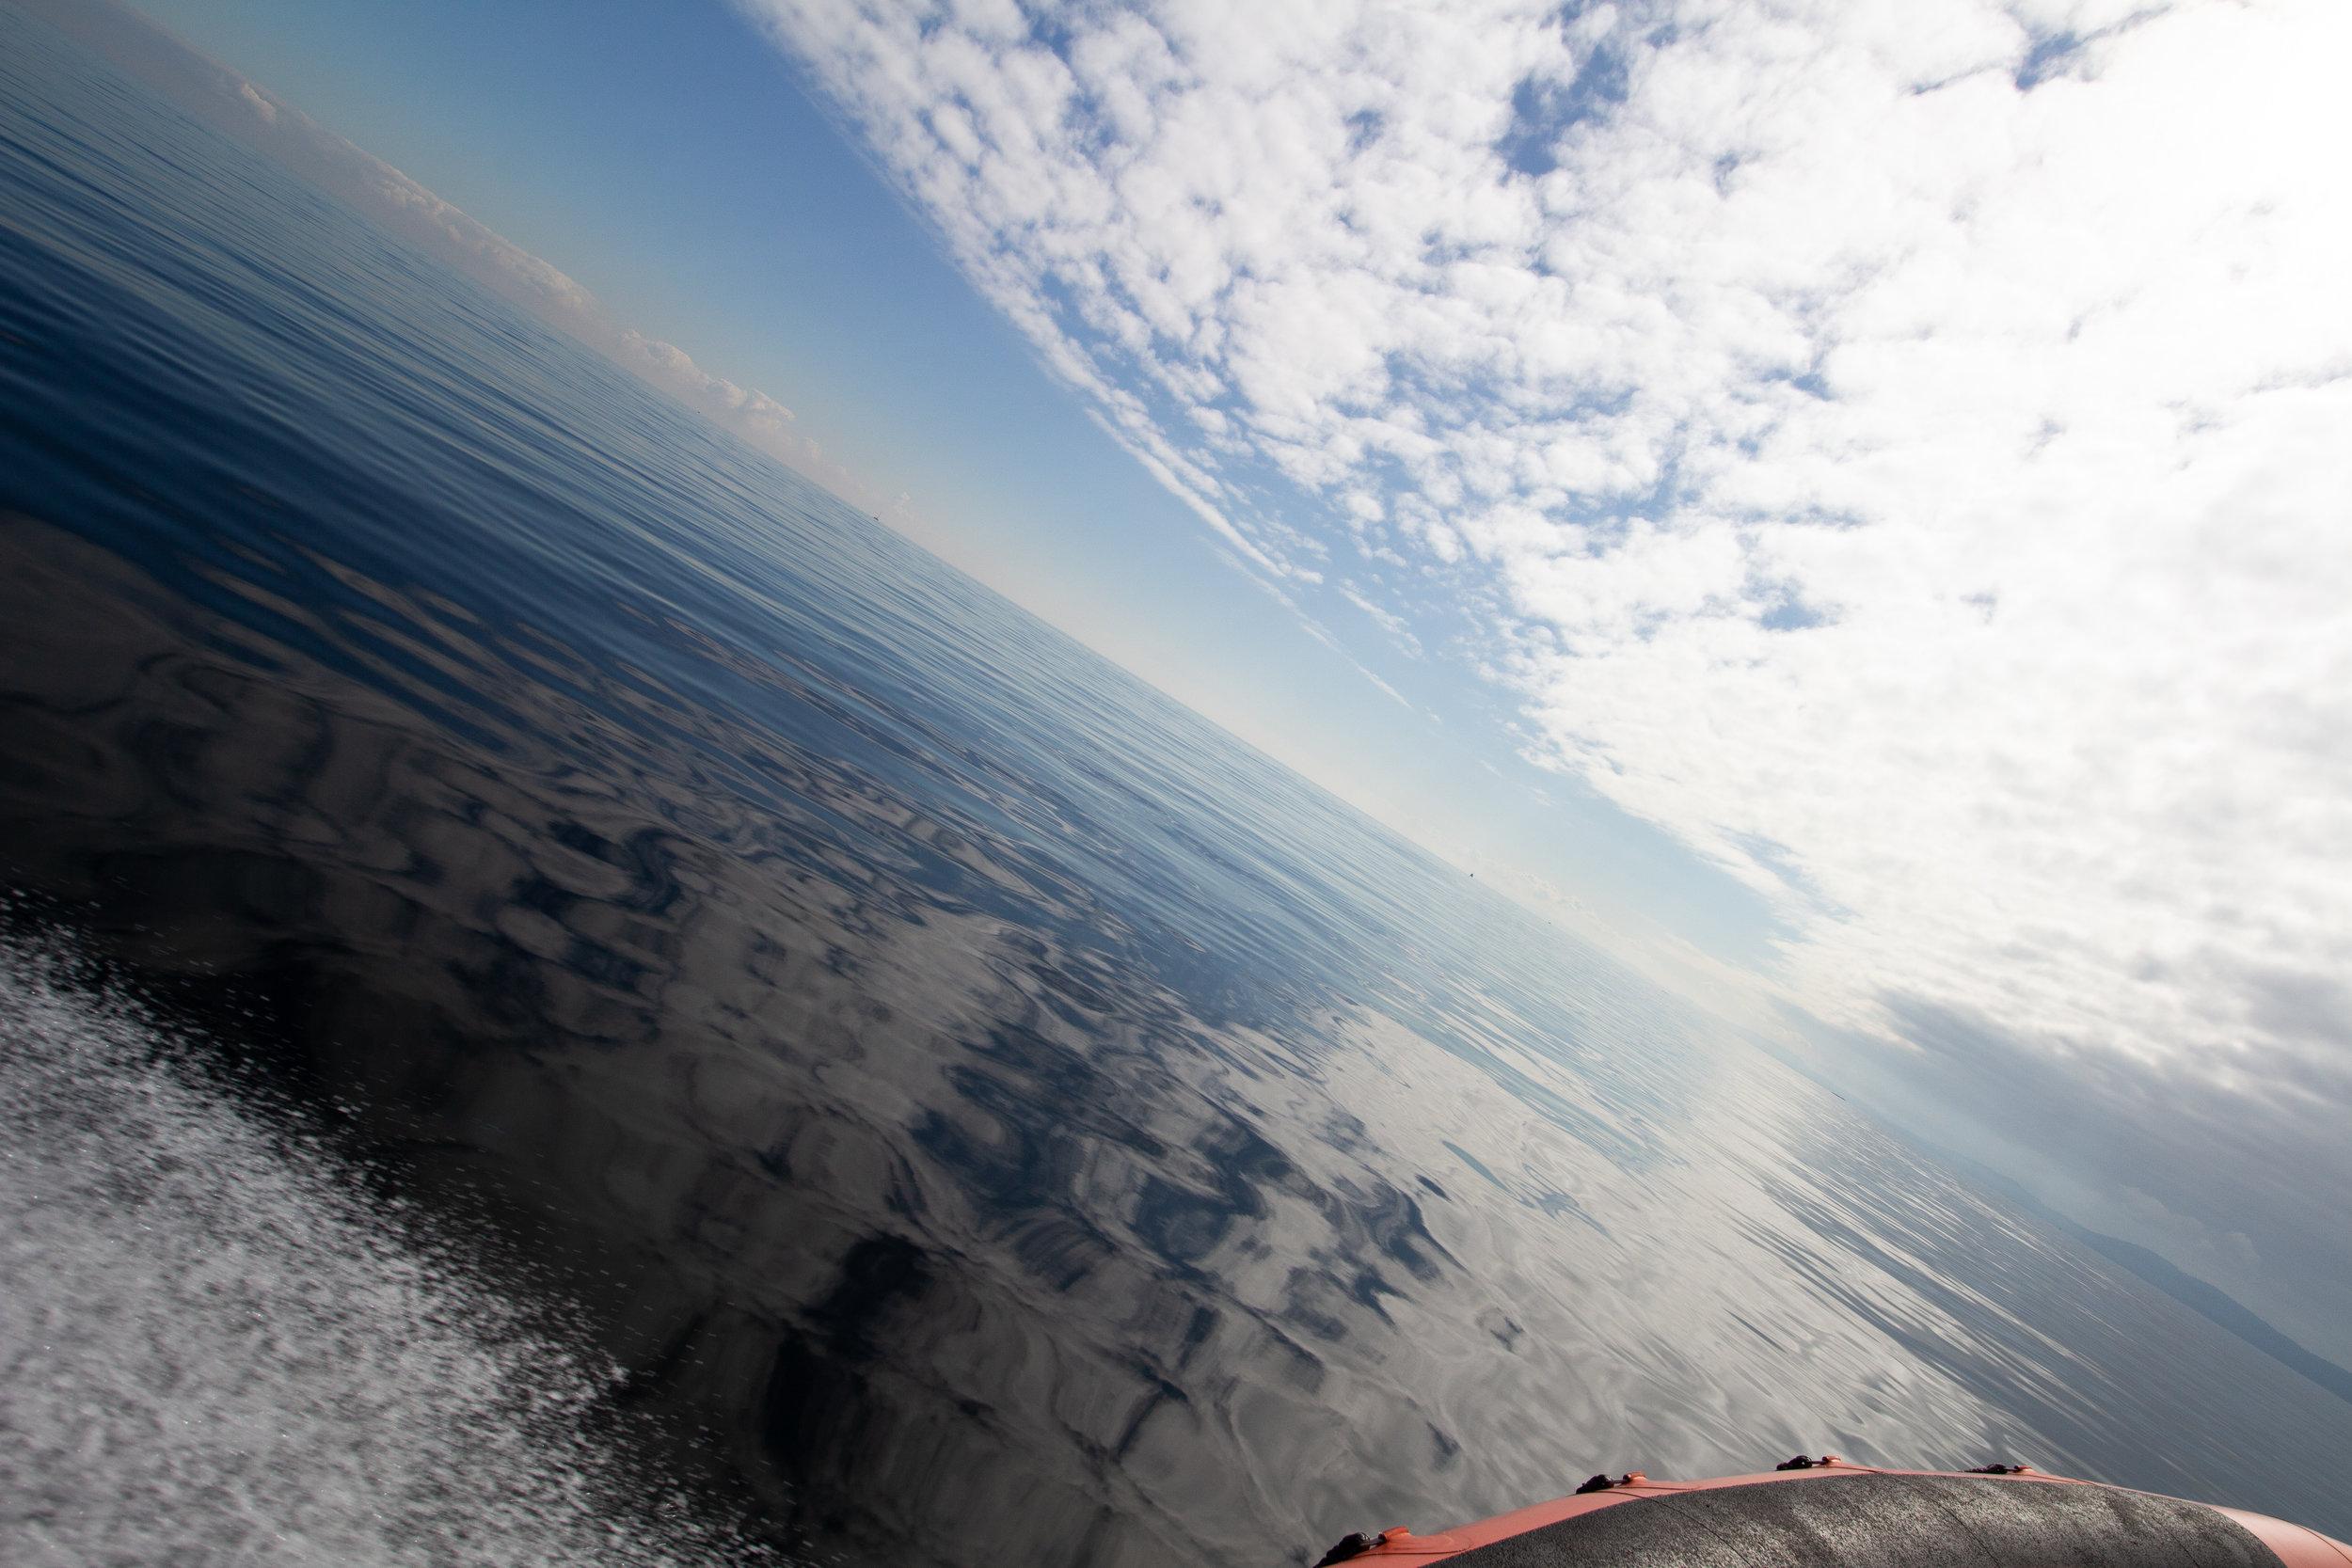 Seas like glass! Photo by Natalie Reichenbacher